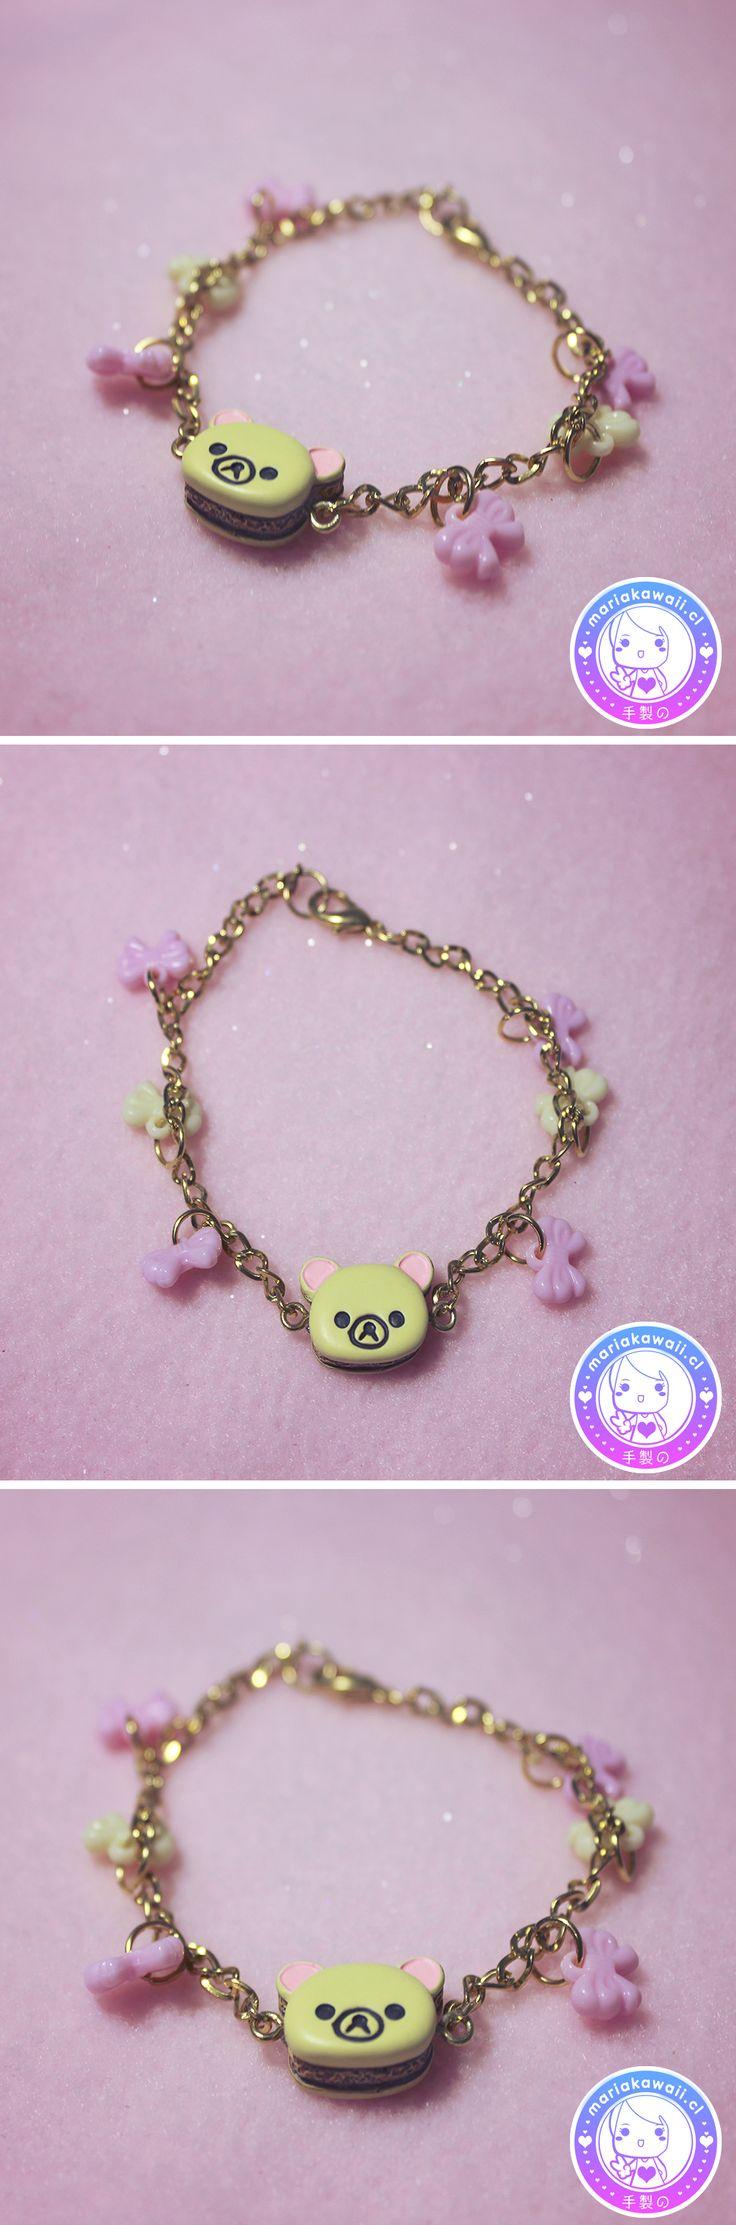 María Kawaii Store ♥ Korilakkuma Bracelet with Ribbons